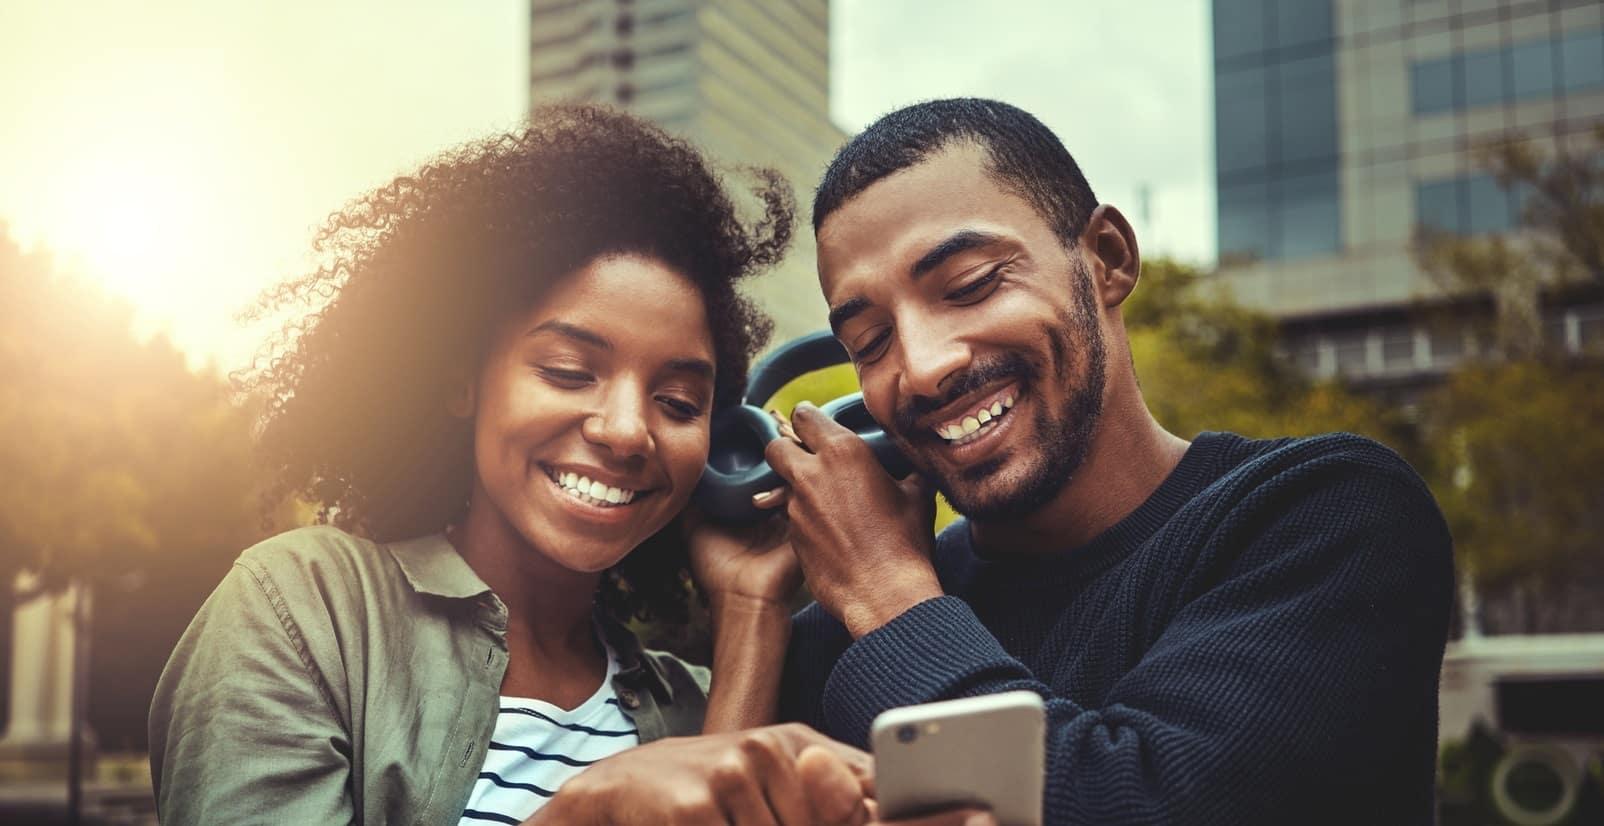 homme femme casque audio smartphone ville